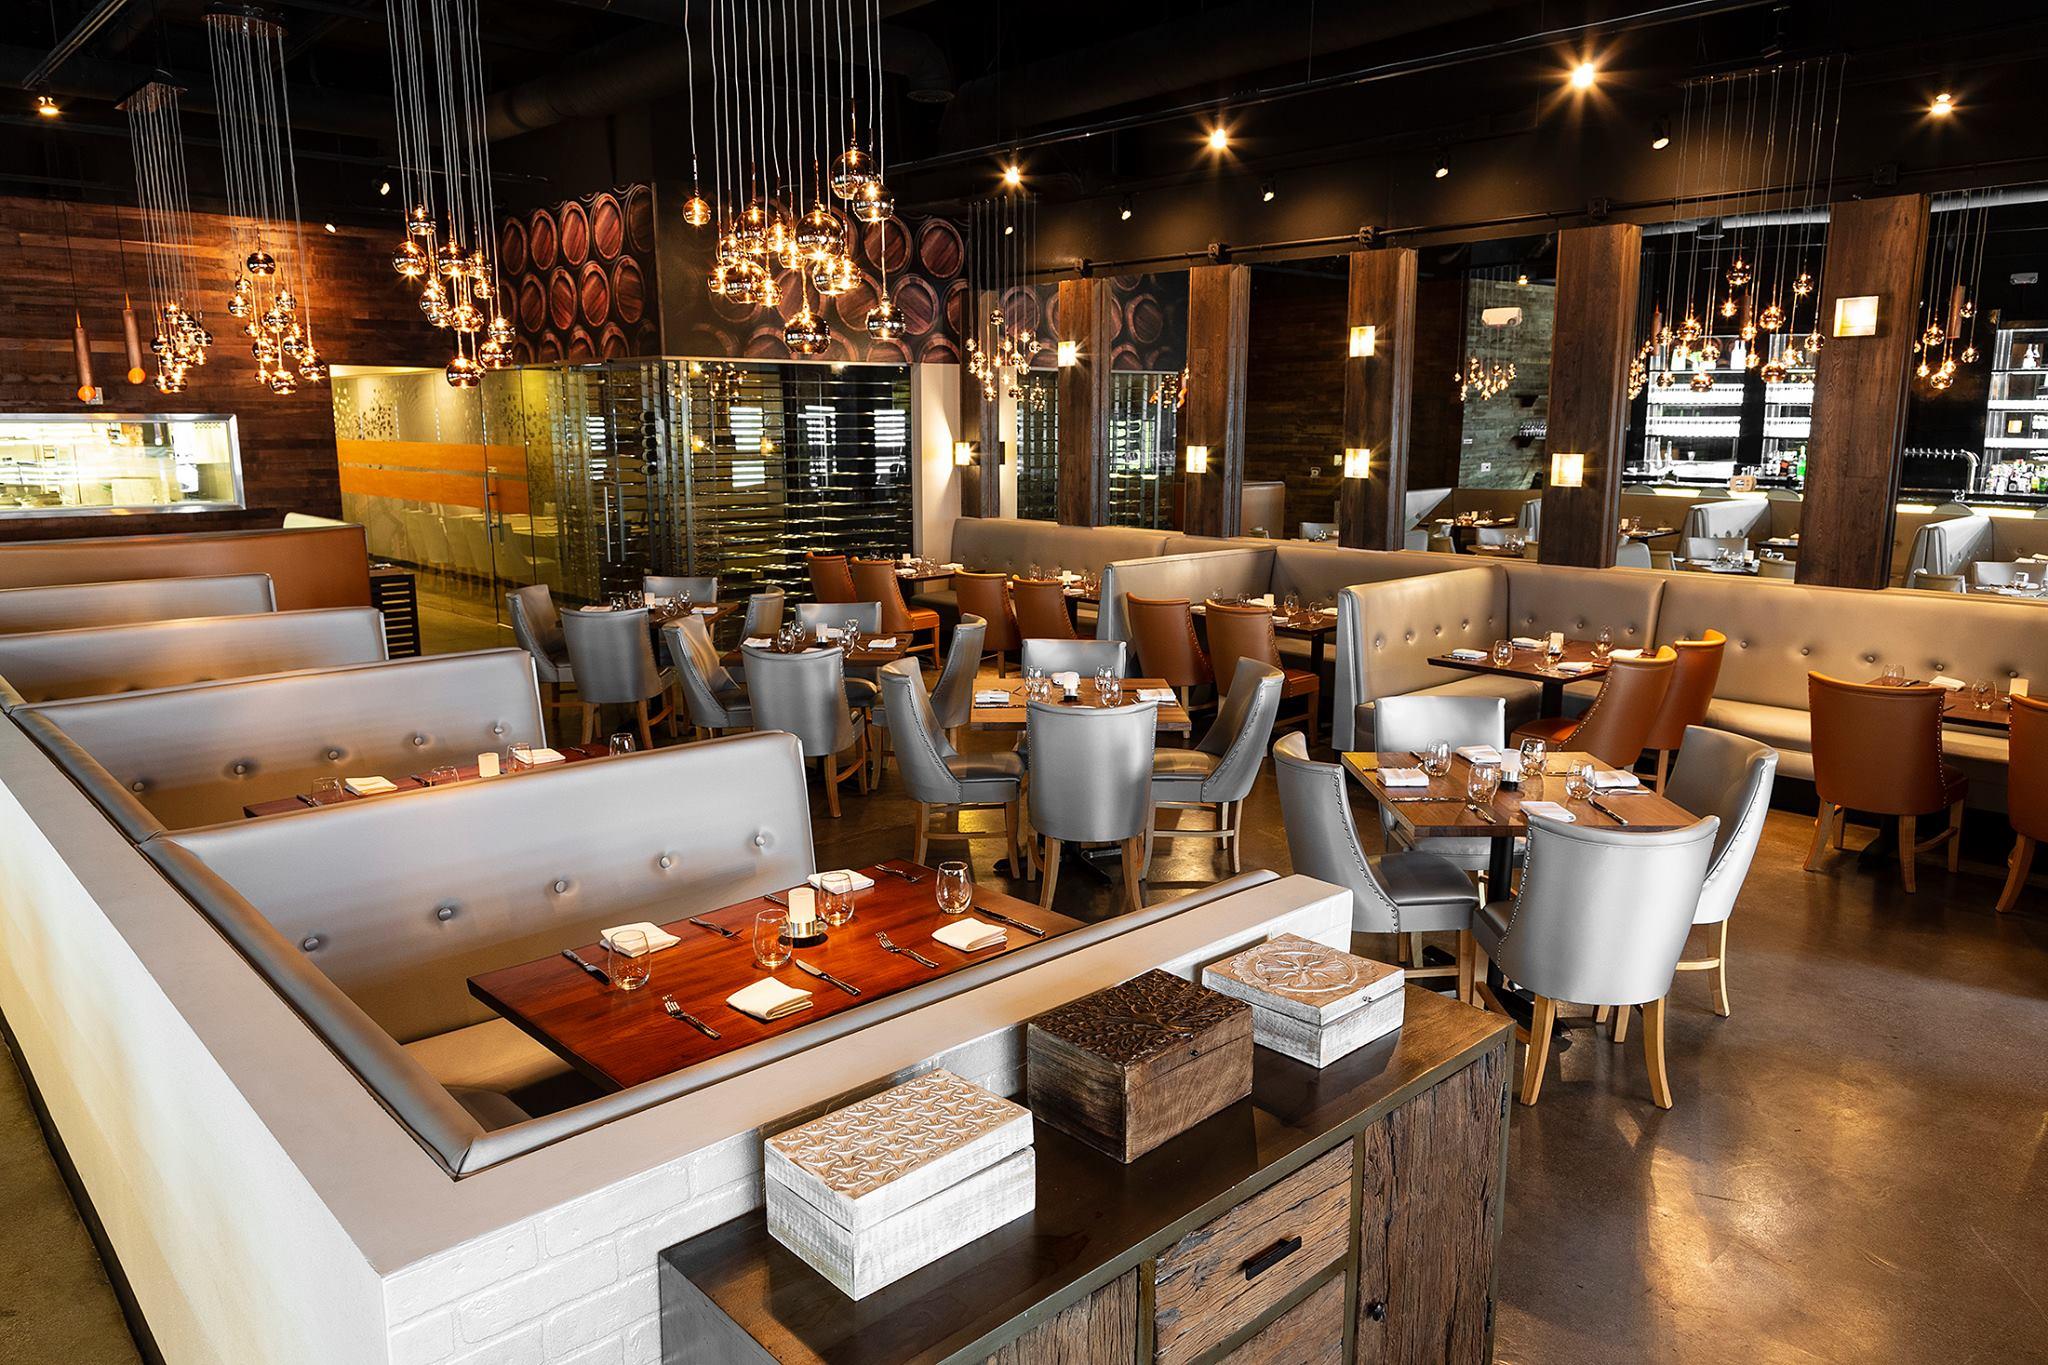 The interior of a restaurant